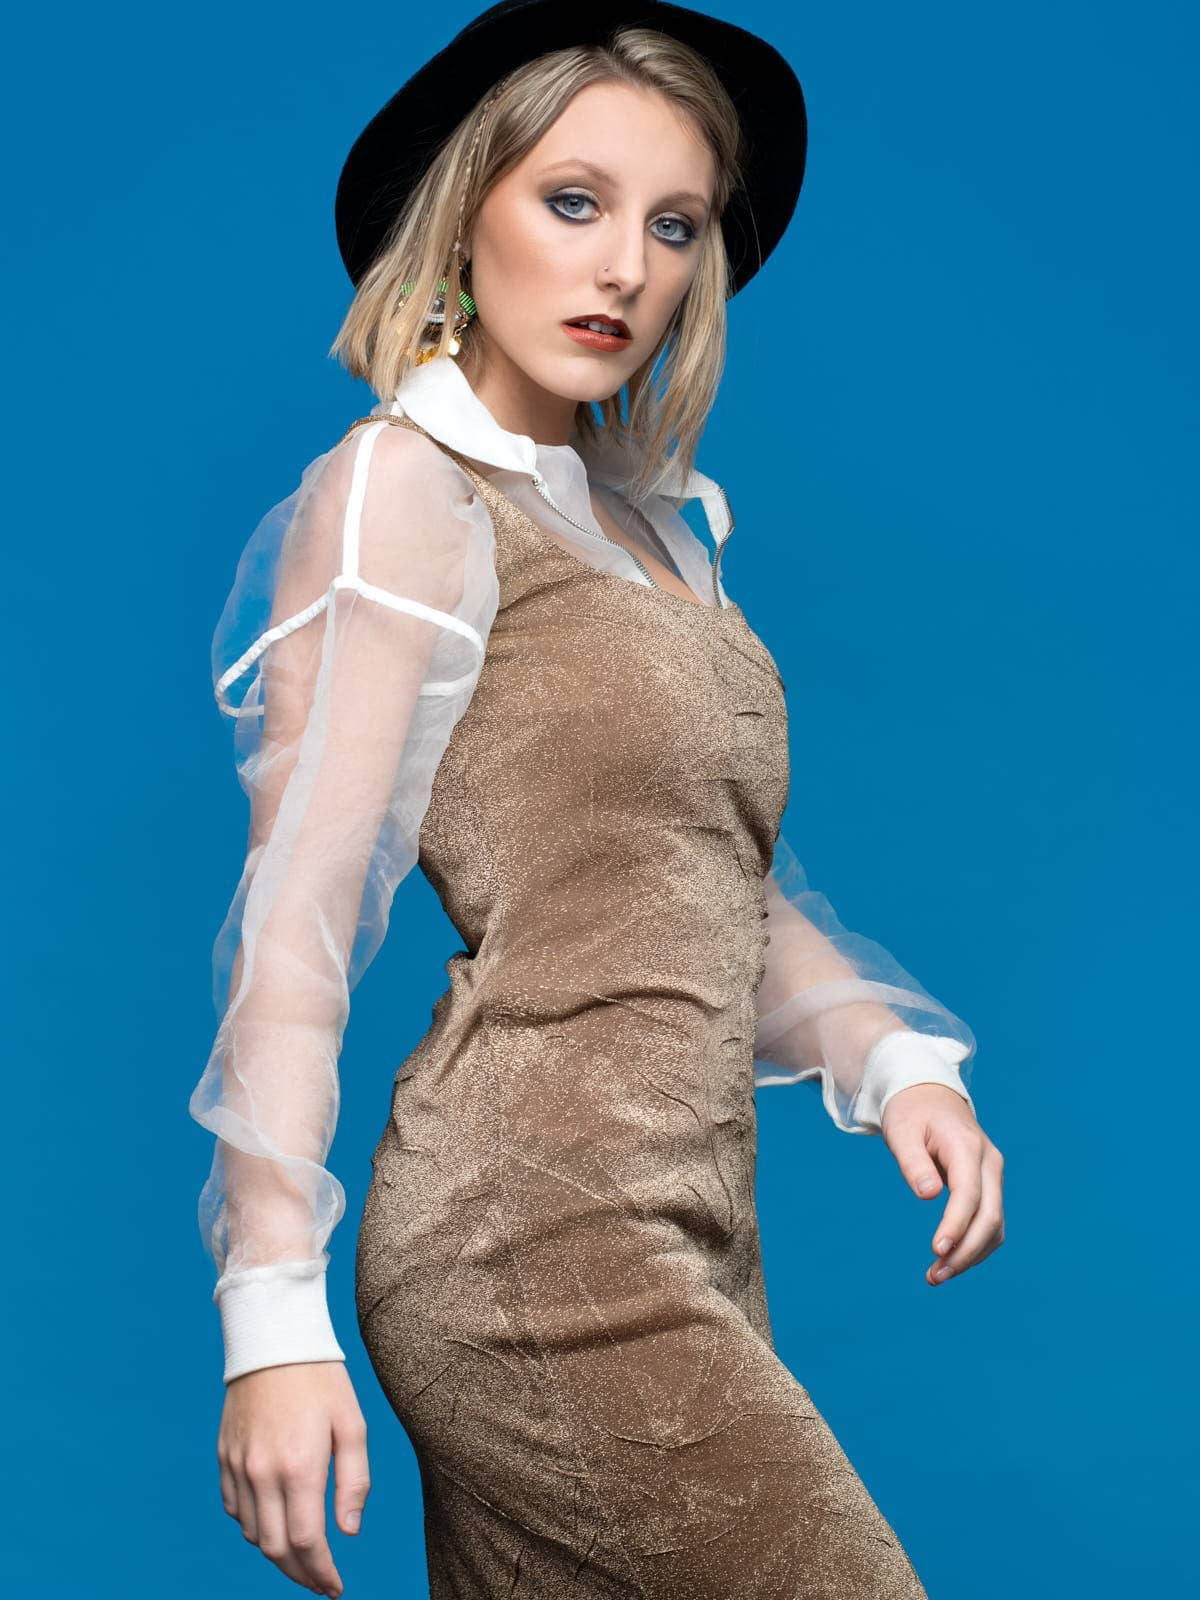 sce-agency-female-model-jordan-g-70